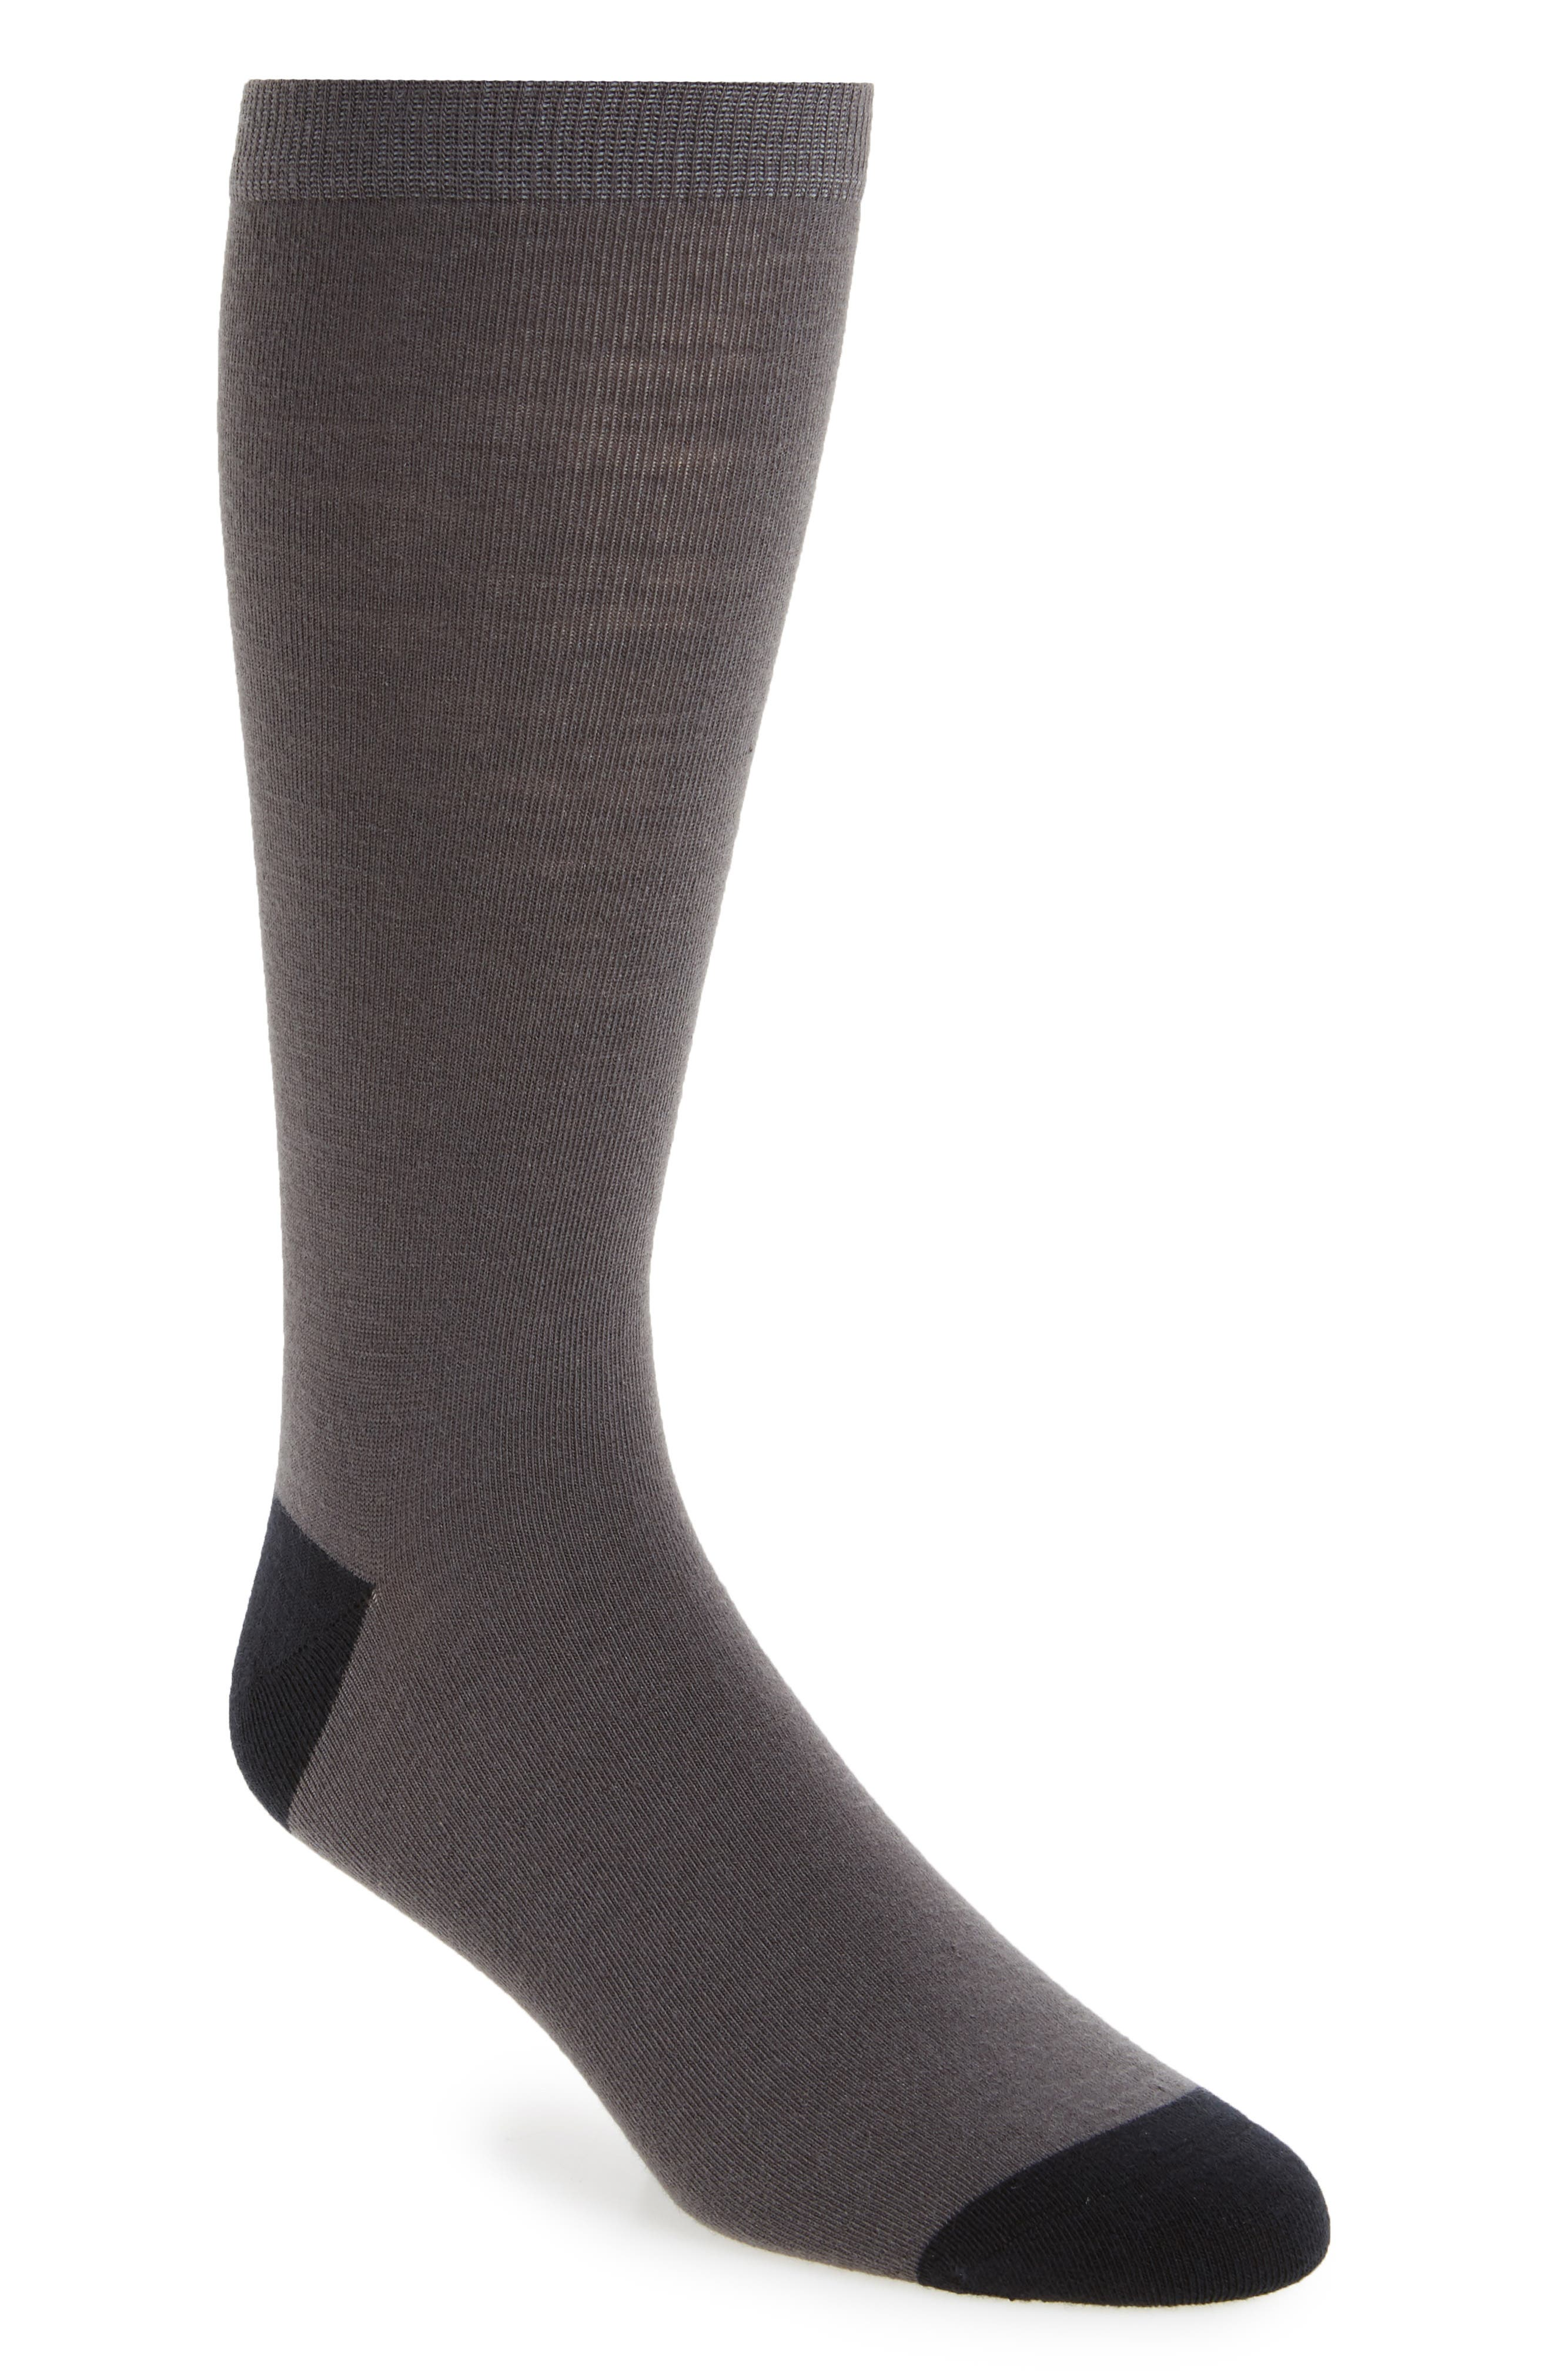 Colorblock Socks,                         Main,                         color, Charcoal